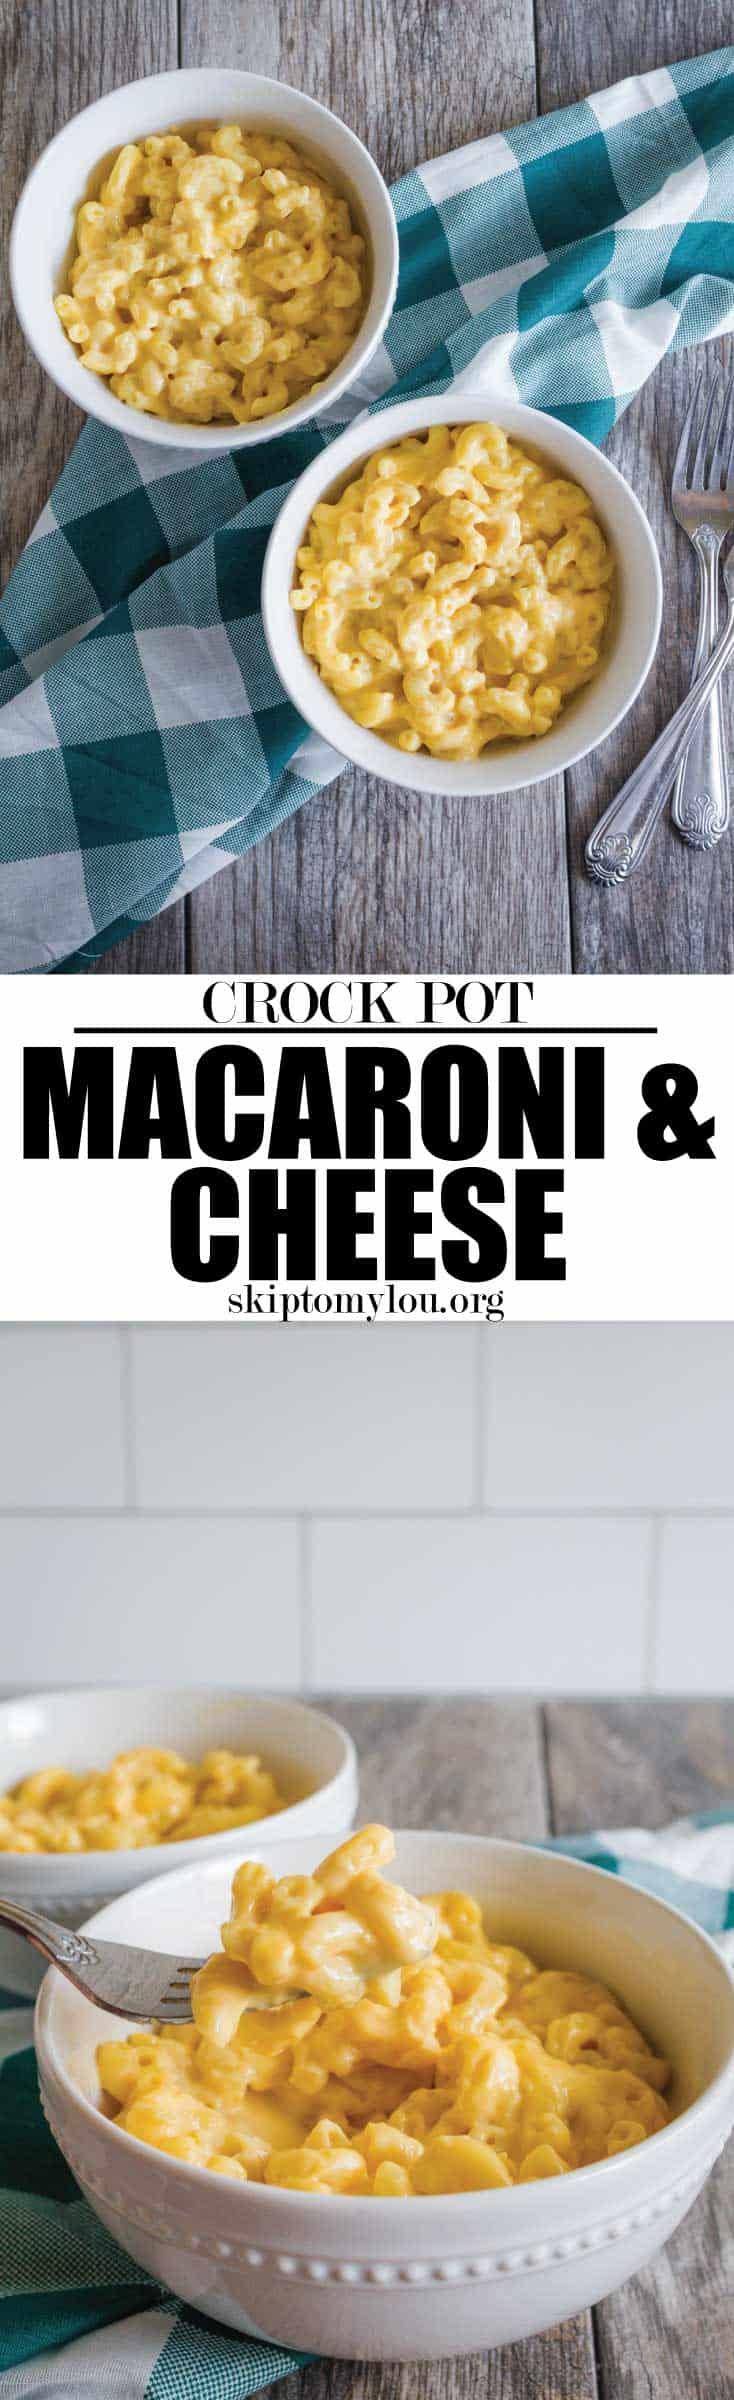 Crock-Pot-Macaroni-And-Cheese-Pinterest-Skip-To-My-Lou